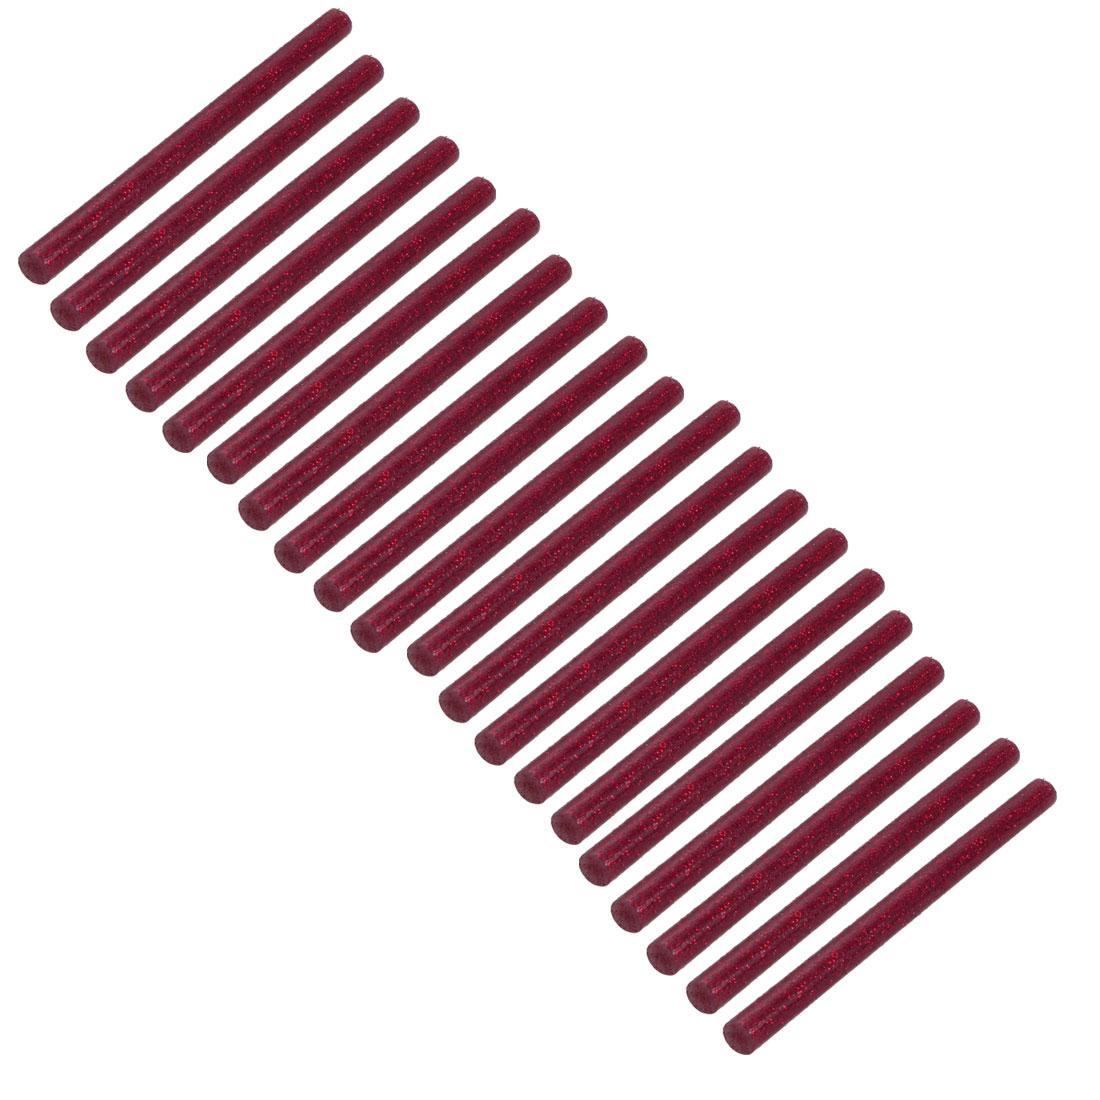 20pcs 7mm Dia 100mm Long Hot Melt Glue Adhesive Stick Shinning Red